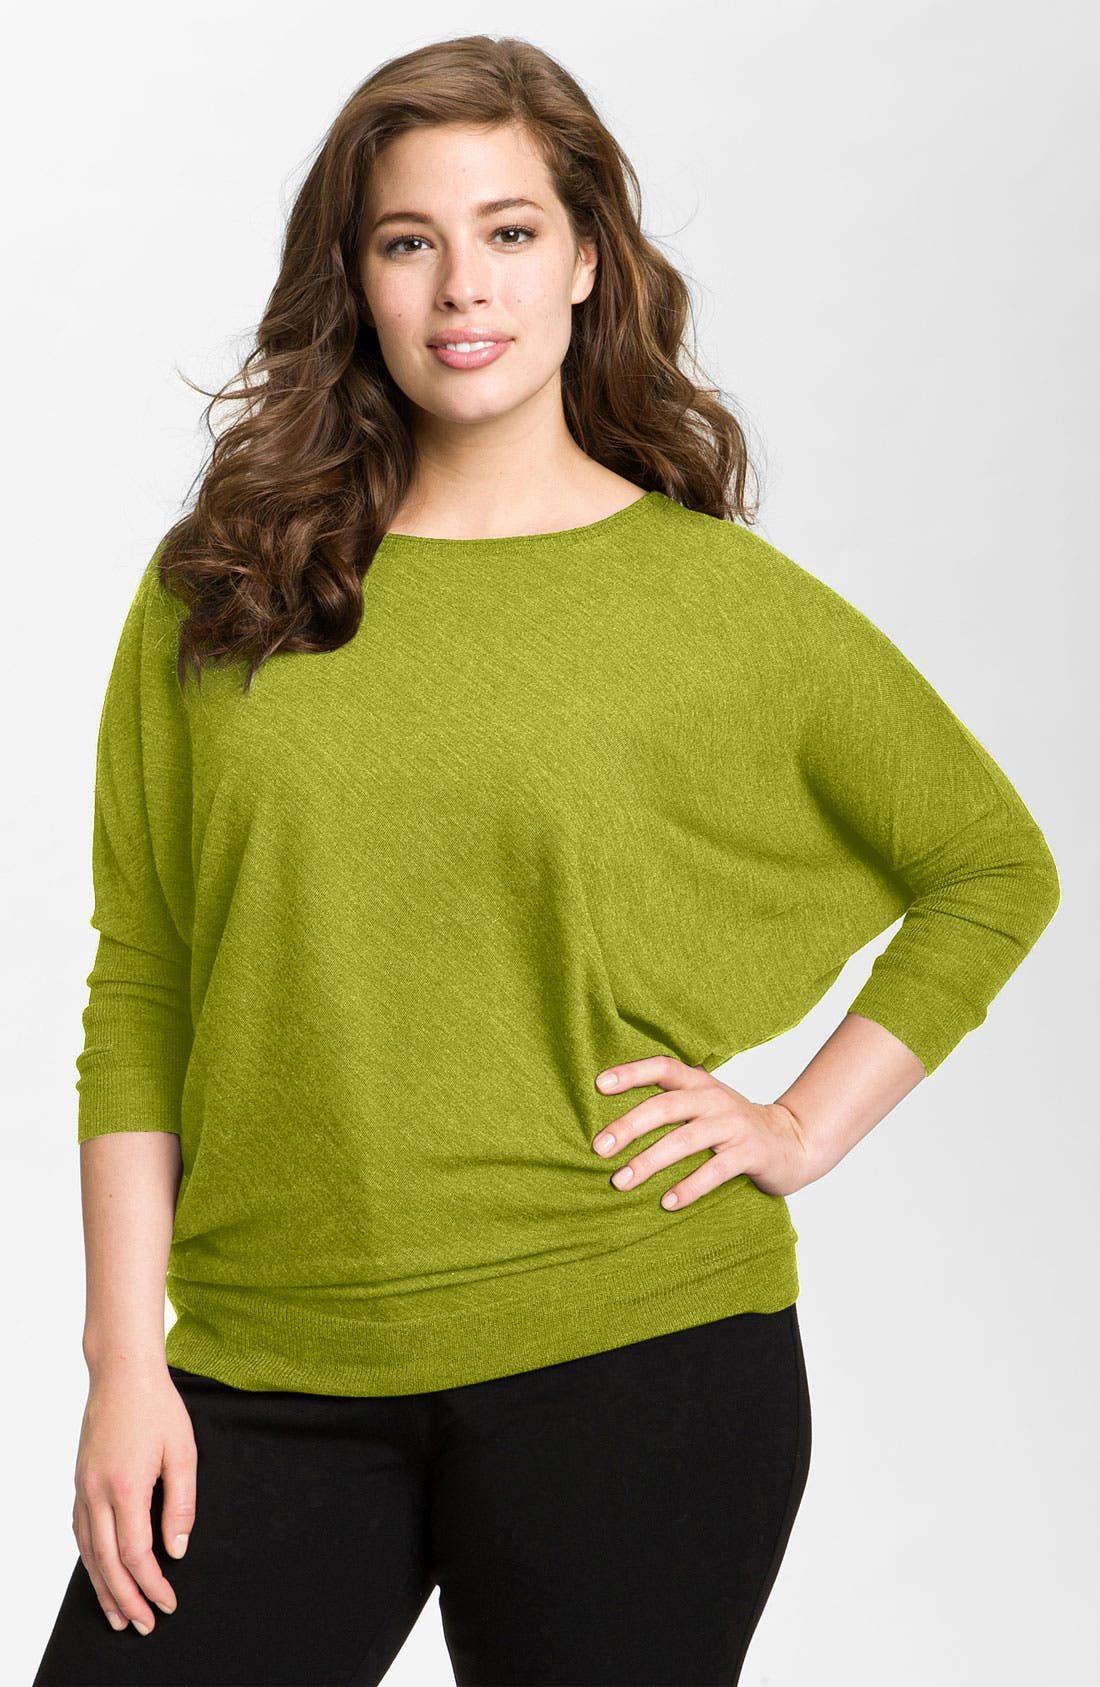 Alternate Image 1 Selected - Eileen Fisher Colorblock Merino Wool Sweater (Plus)